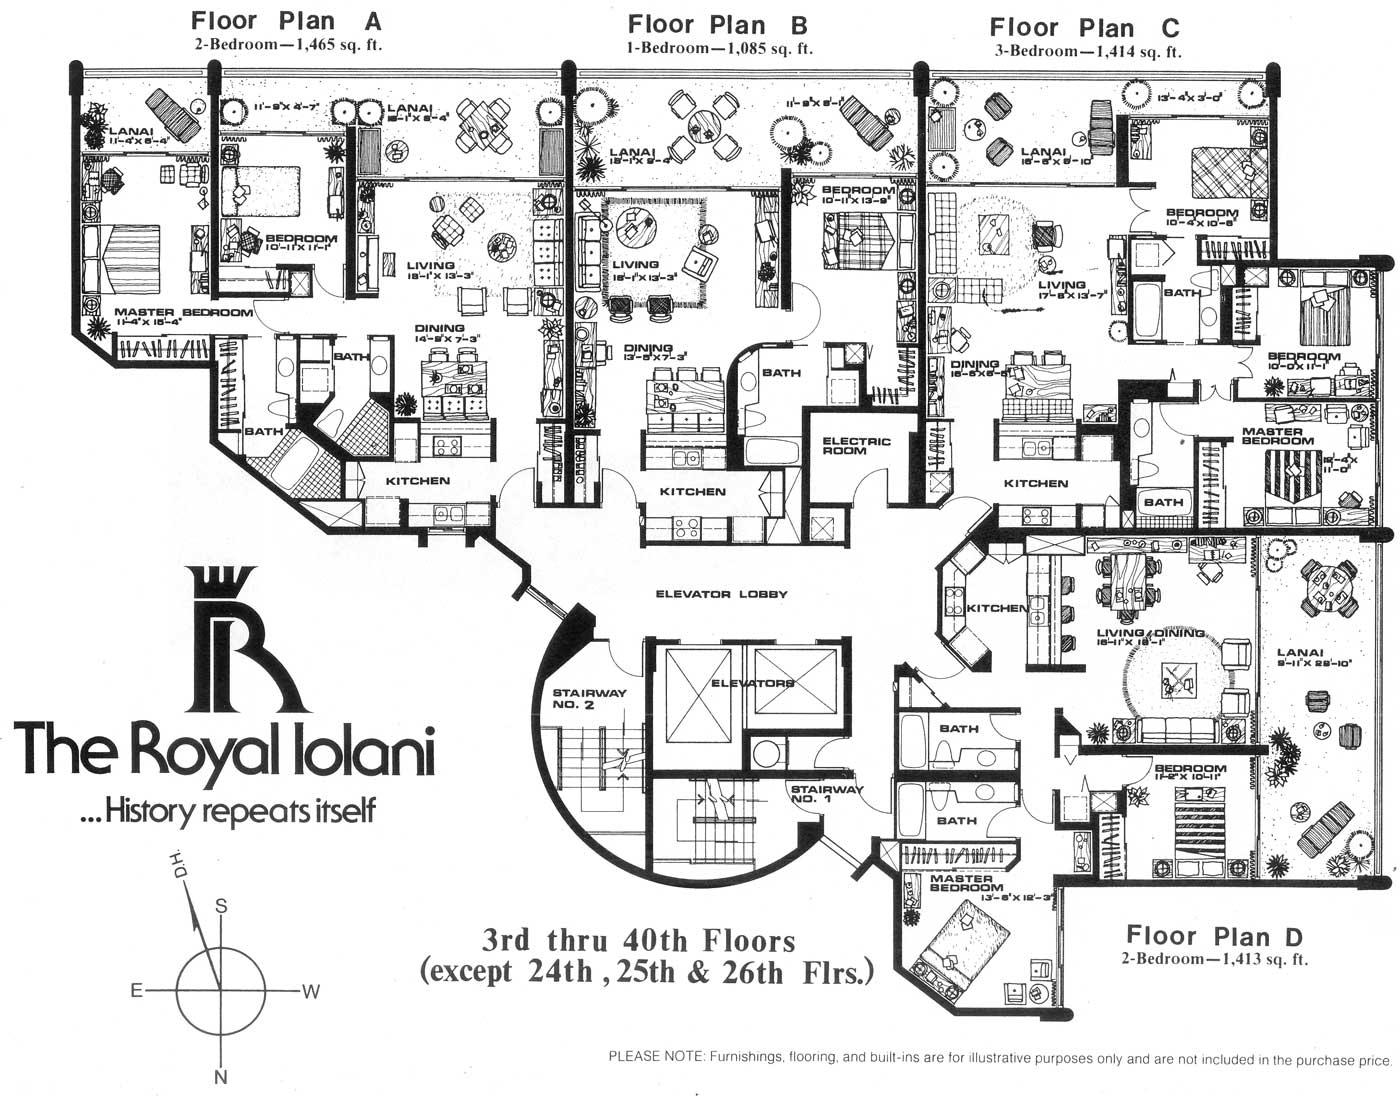 ROYAL IOLANI-The Honolulu, Hawaii State Condo Guide.com